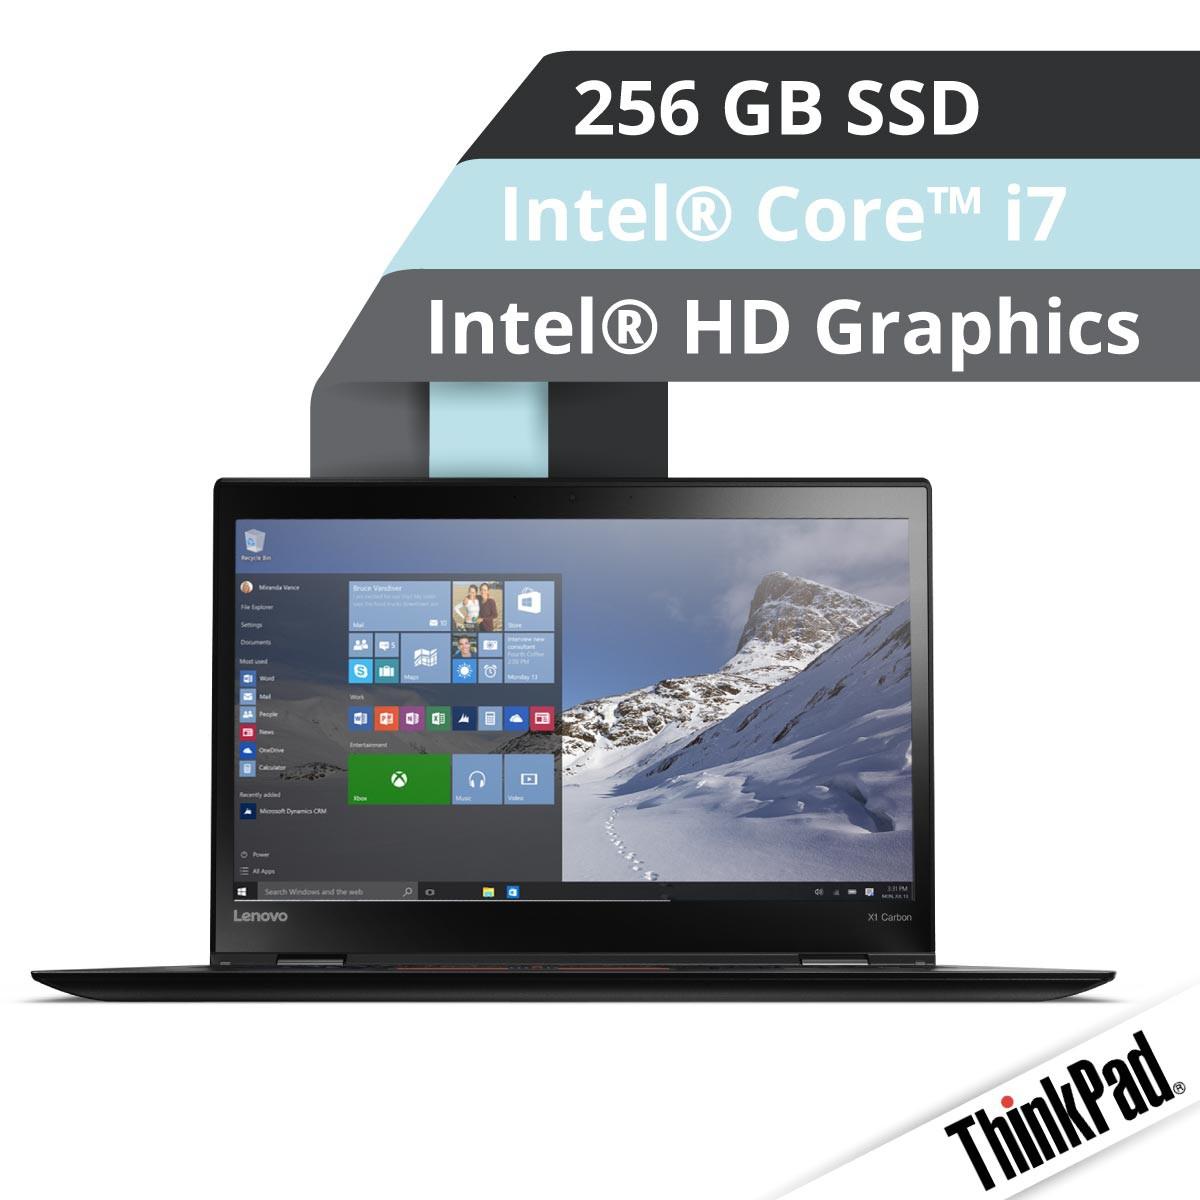 (EOL) Lenovo™ ThinkPad® X1 Carbon Ultrabook Modell 20FB-003R